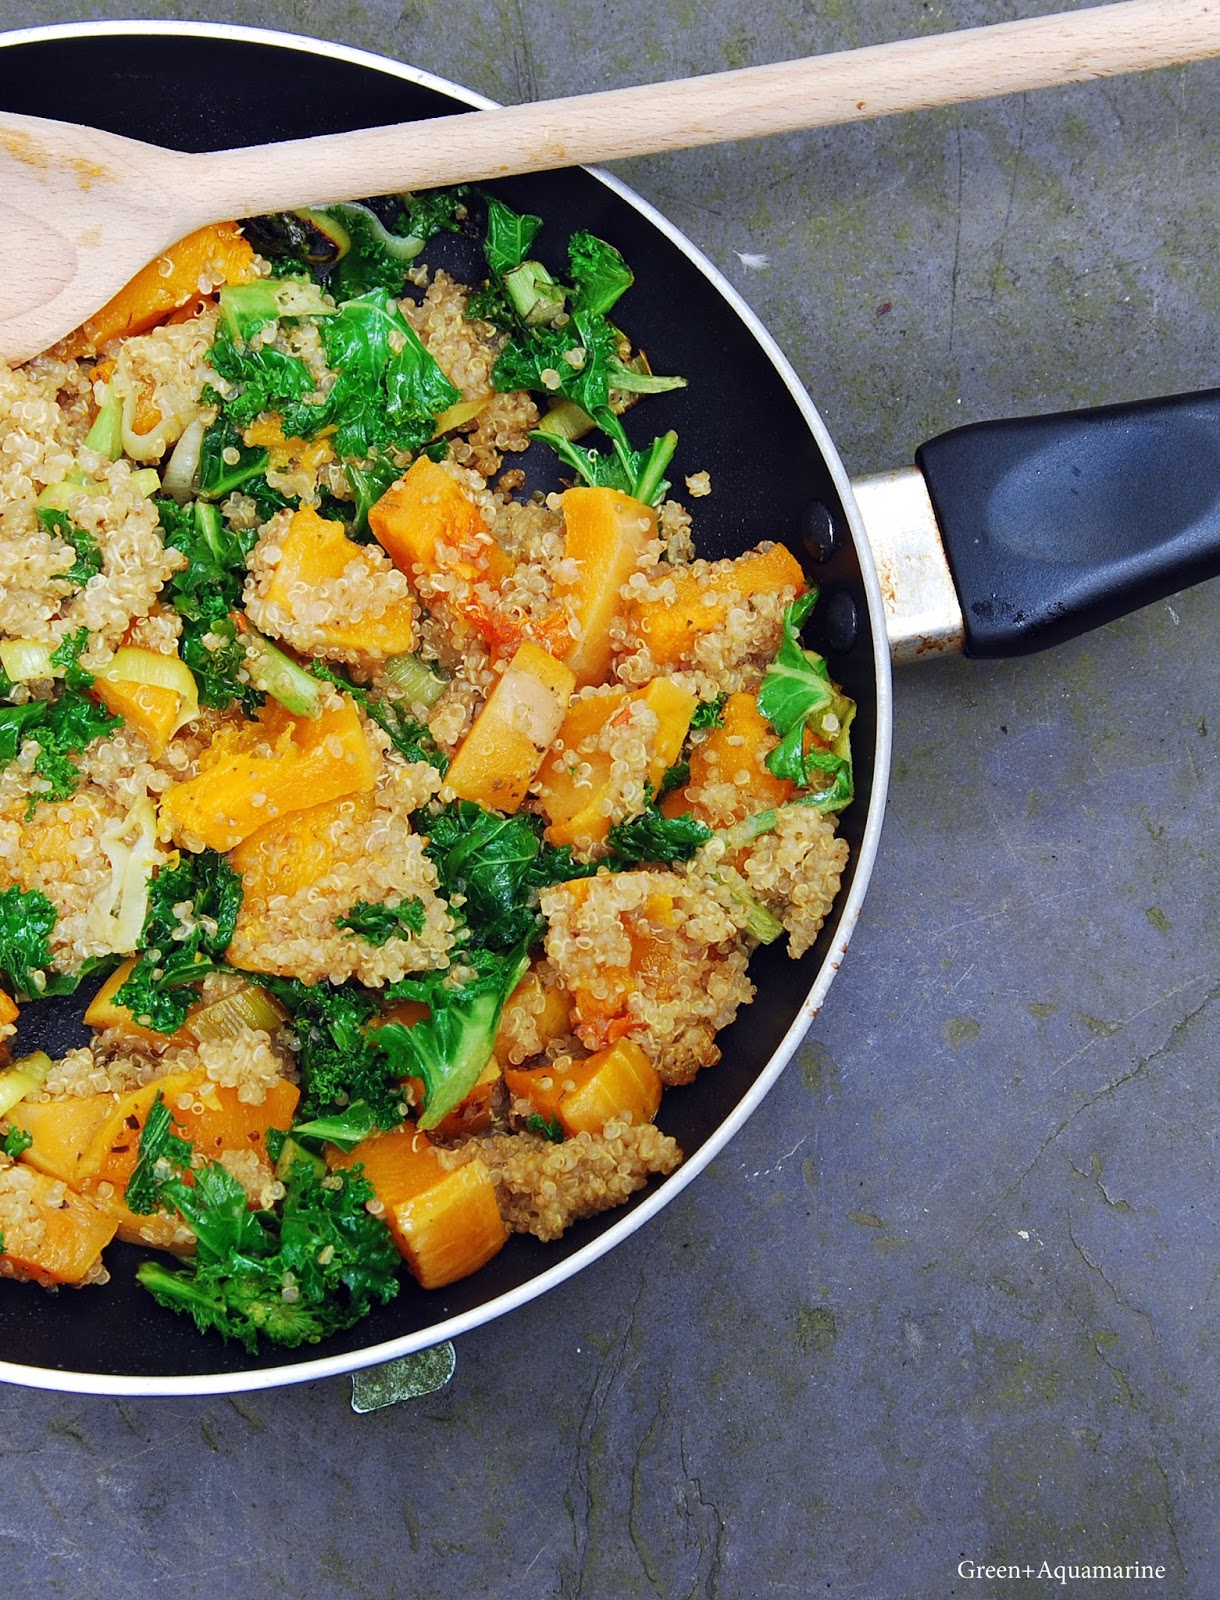 Kale, squash and quinoa savoury breakfast bowl. Via @eleanormayc